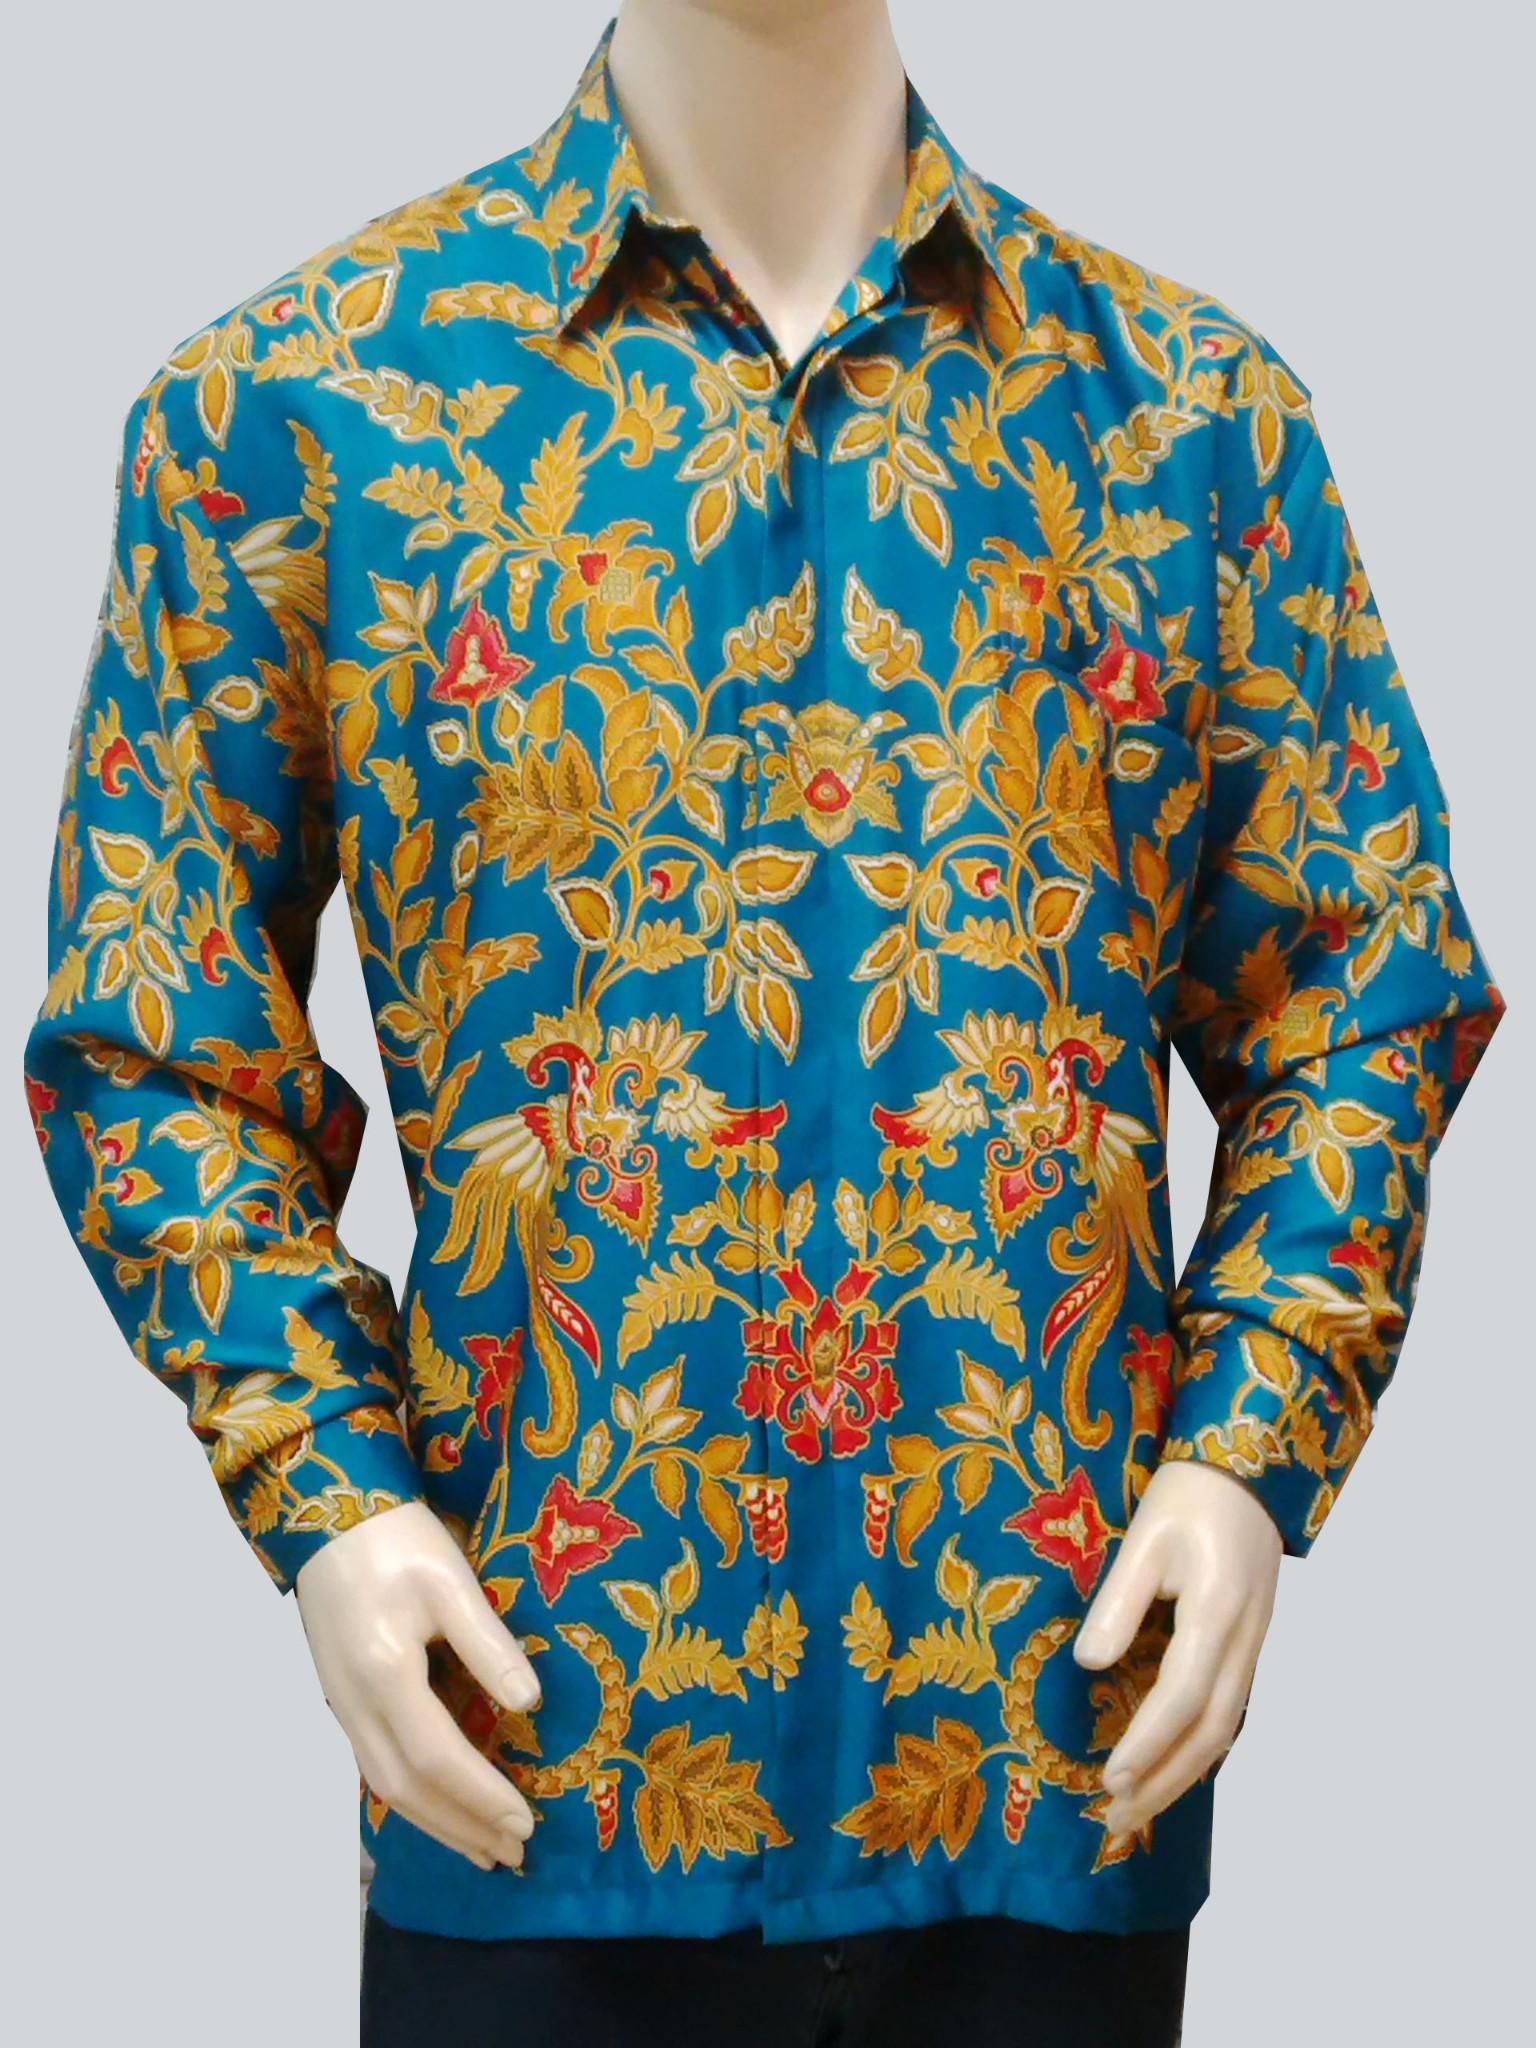 Harga Kemeja Batik Solo . Hem Lengan Panjang Semi Sutra .Baju Batik ...